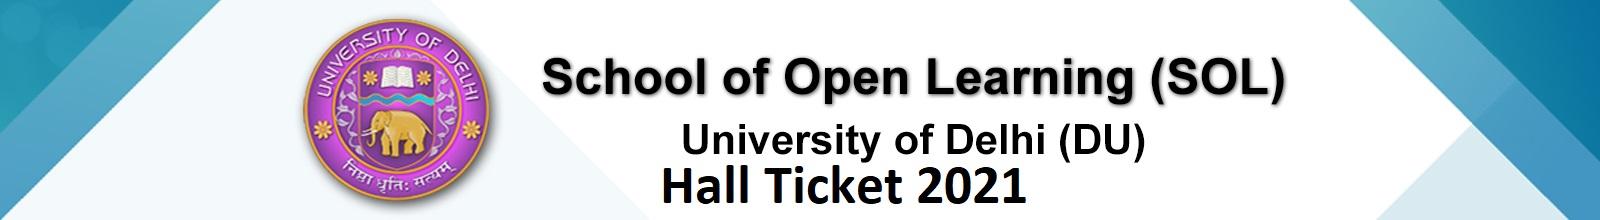 DU SOL Hall Ticket March 2021 For BCOM BA 1 & 3 Sem Exams (OUT) 1